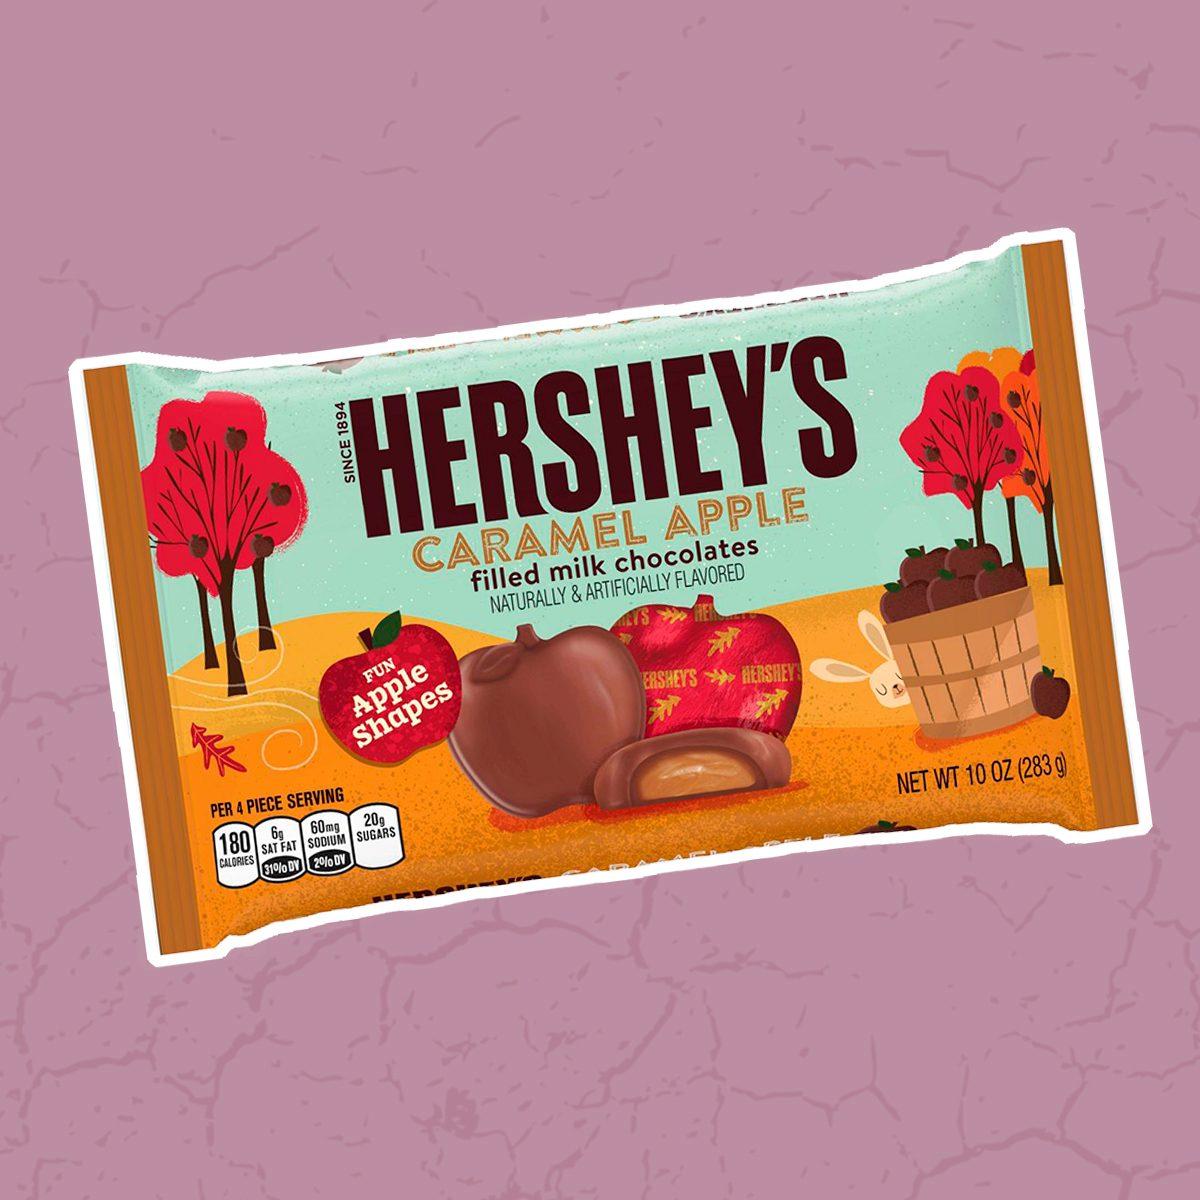 Hershey's Halloween Caramel Filled Apple Chocolates